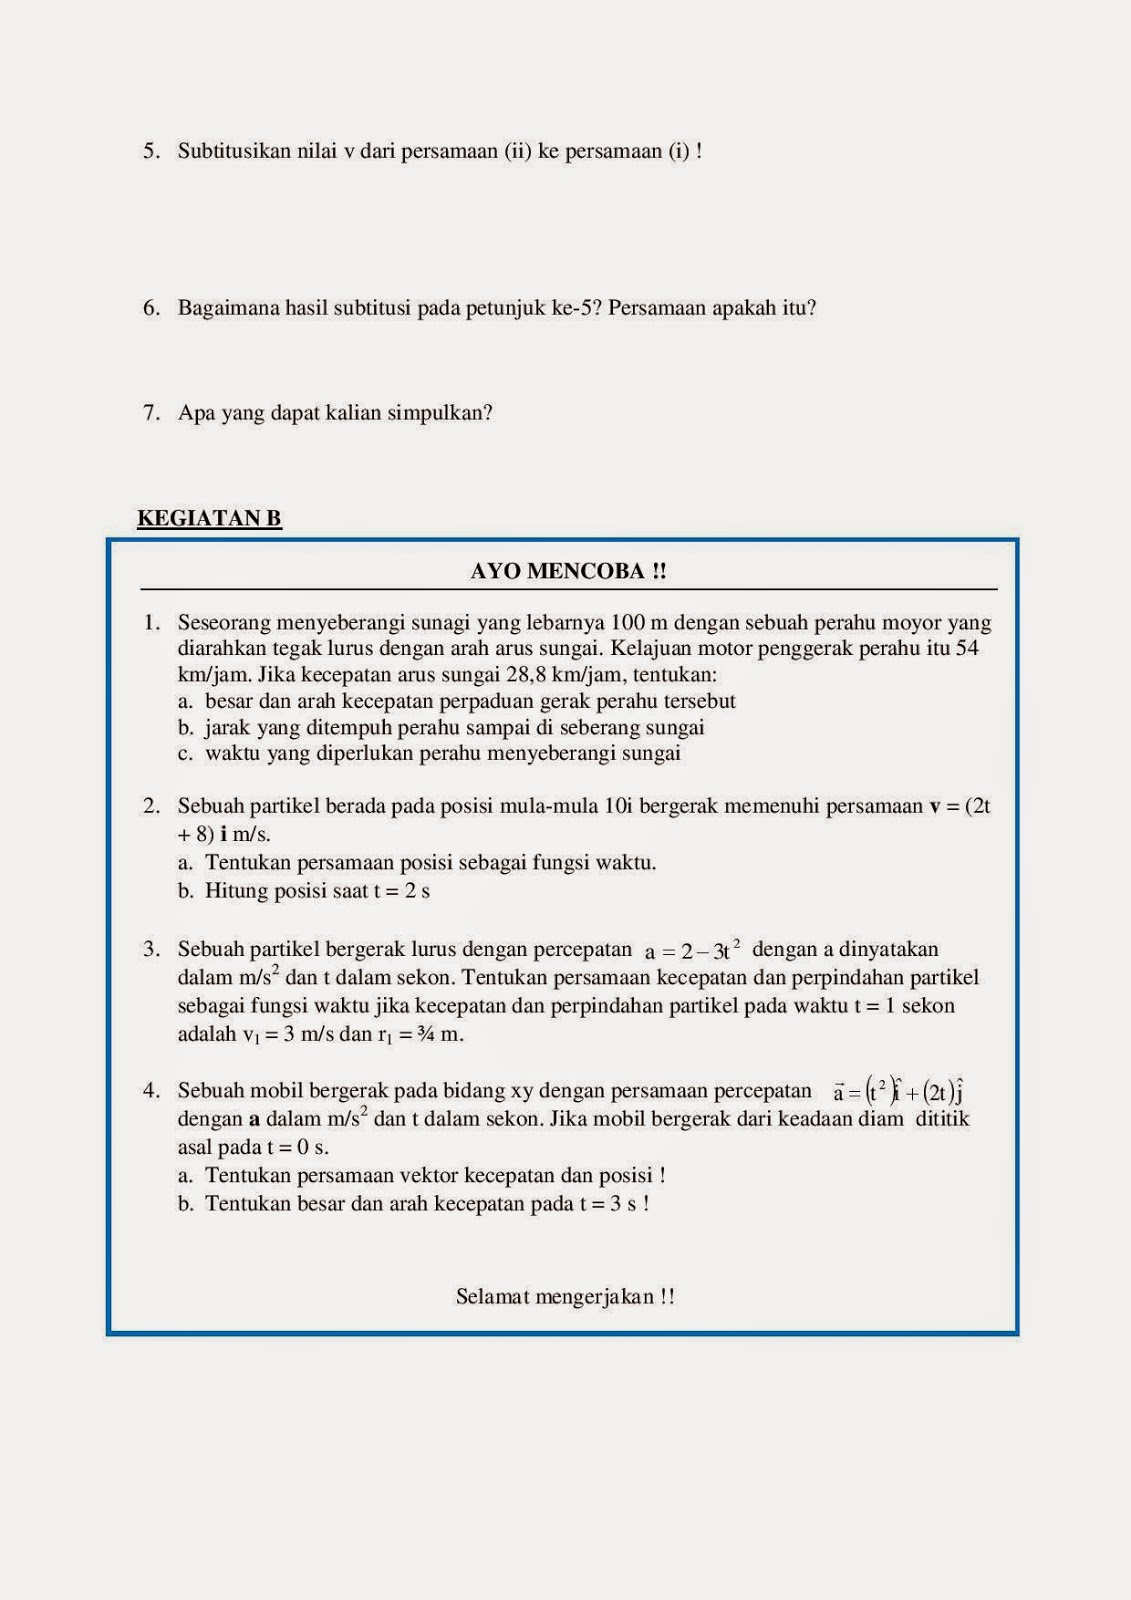 Kunci Jawaban Lks Fisika Kelas X Intan Pariwara Semester 1